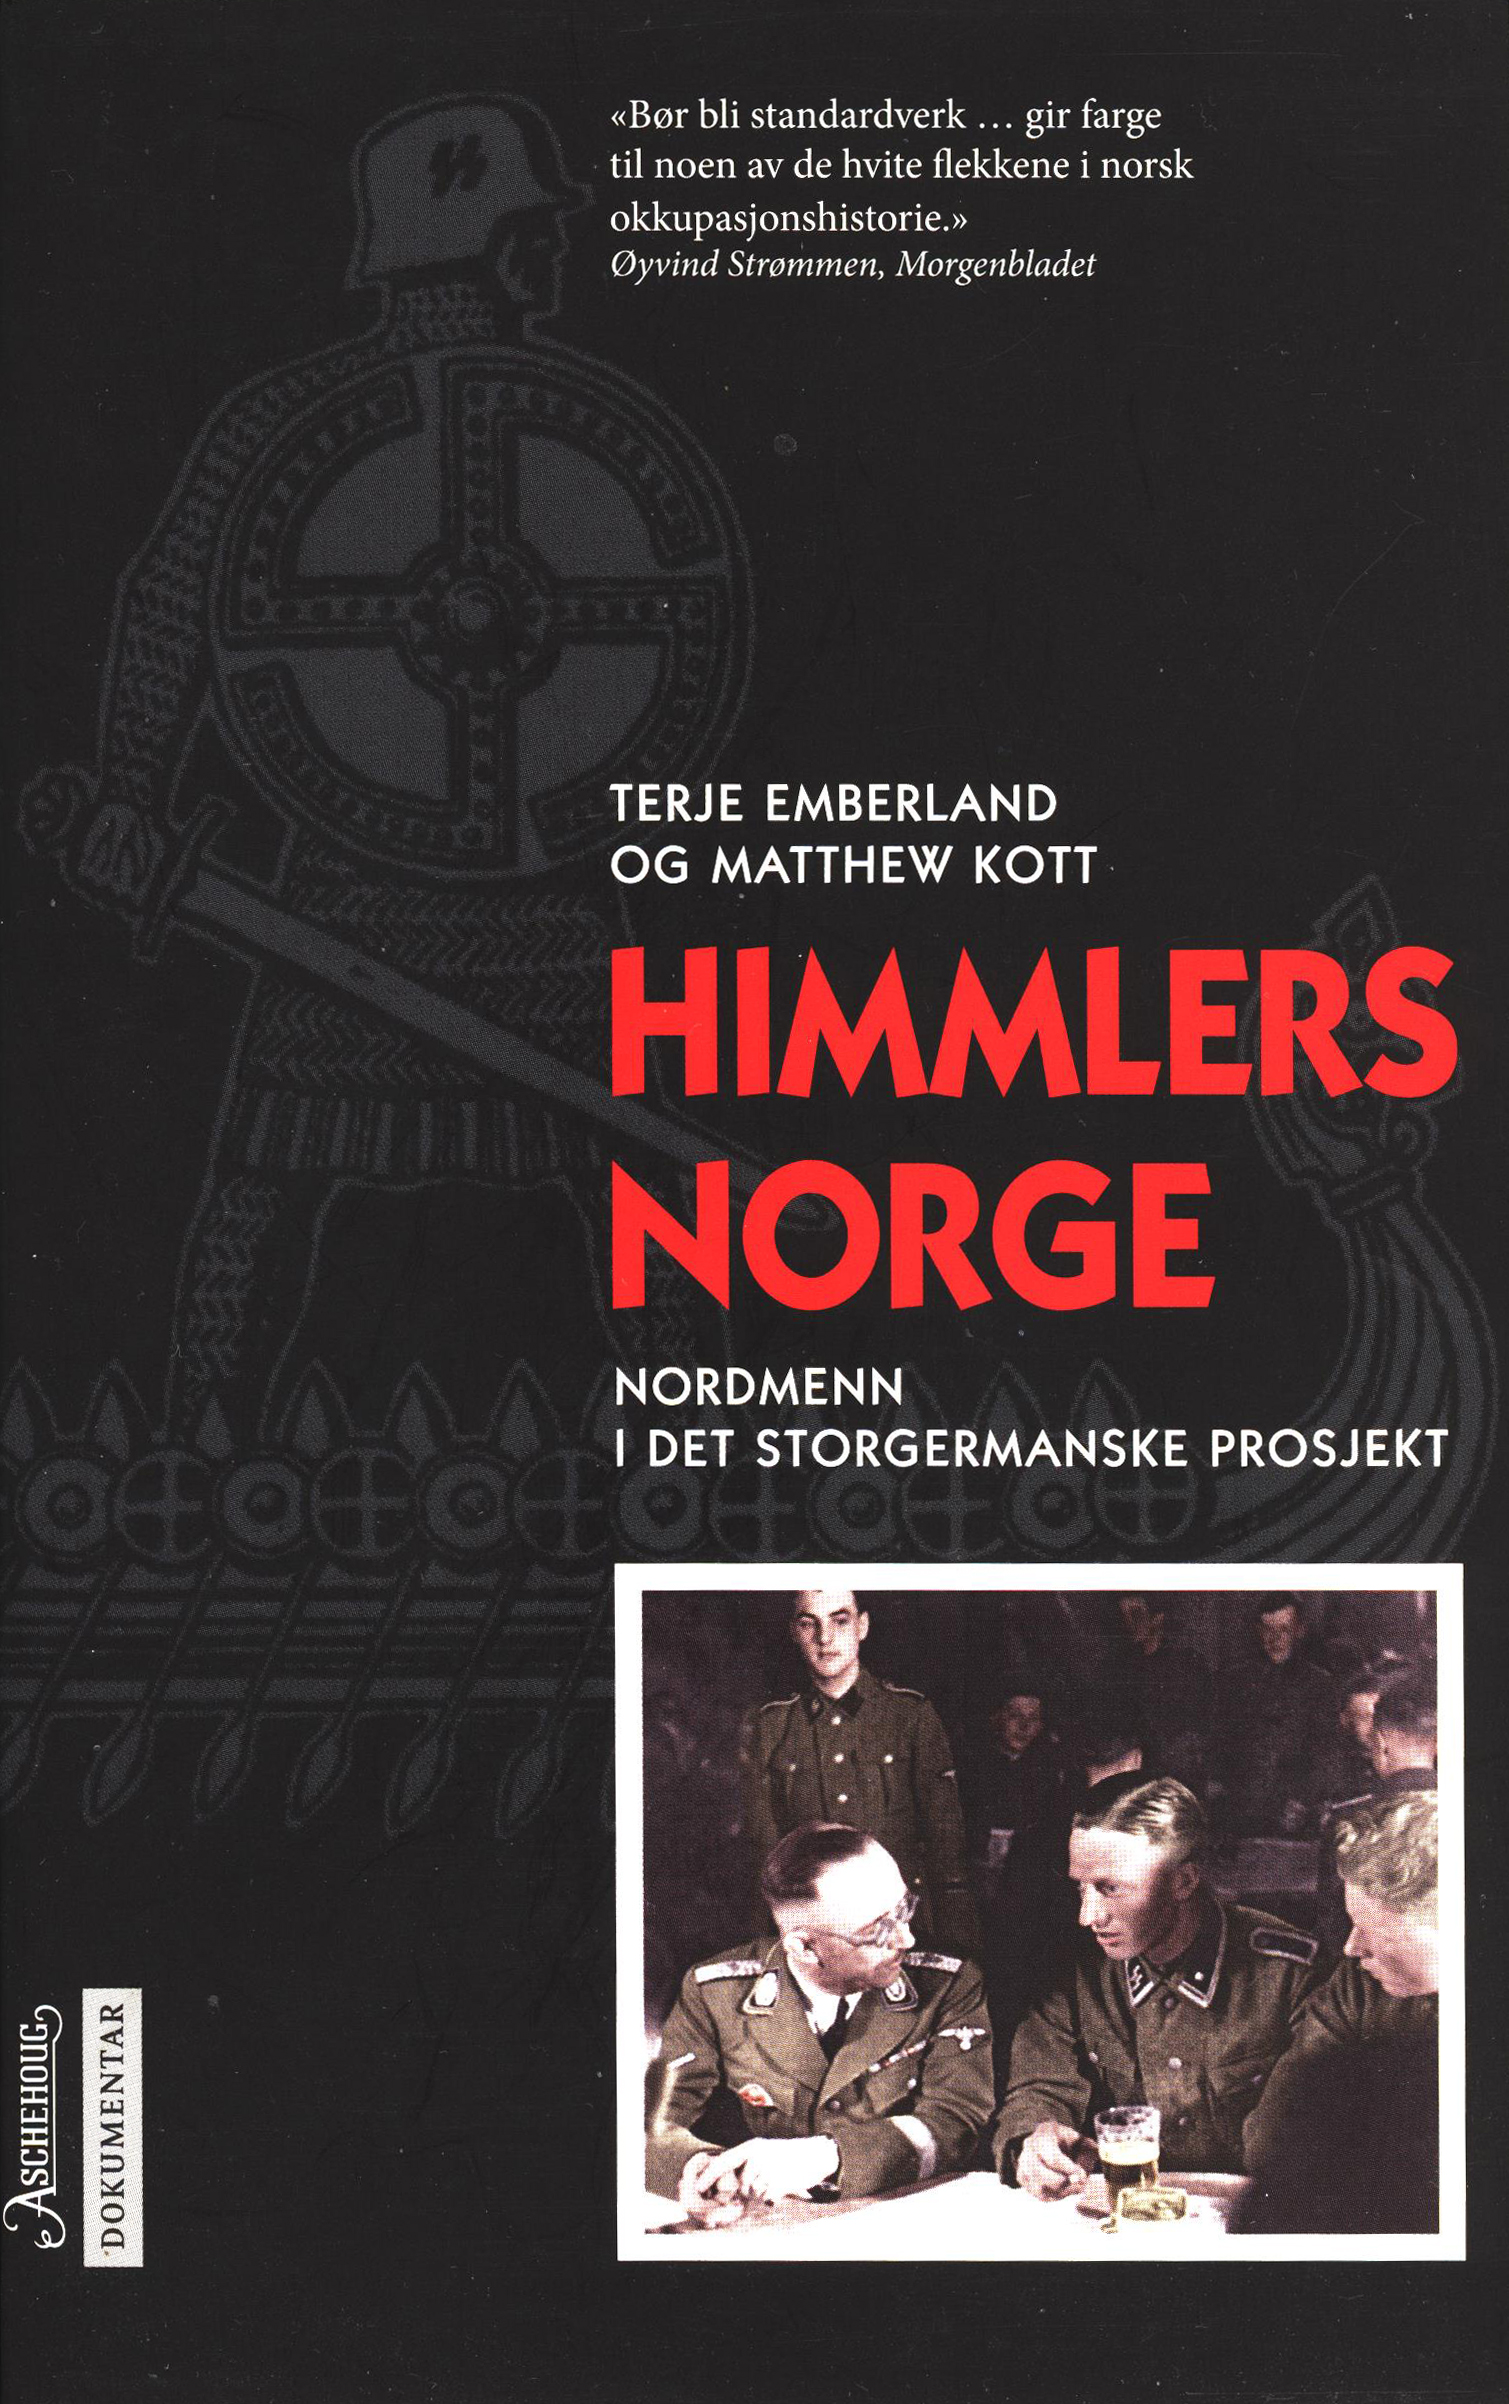 Terje Emberland, Matthew Kott: Himmlers Norge - Nordmenn i det storgermanske prosjekt